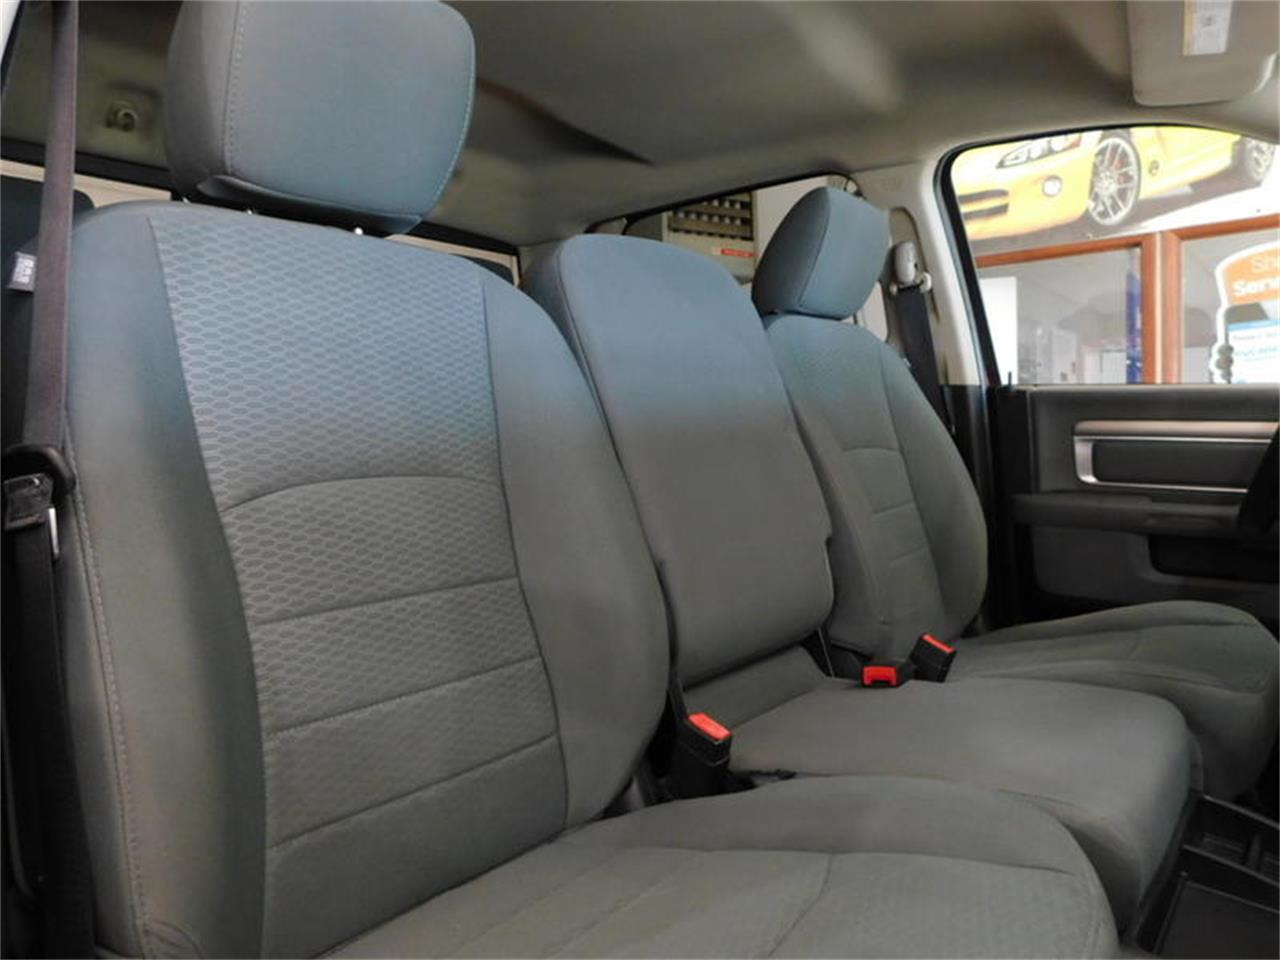 2014 Dodge Ram 1500 (CC-1273061) for sale in Hamburg, New York